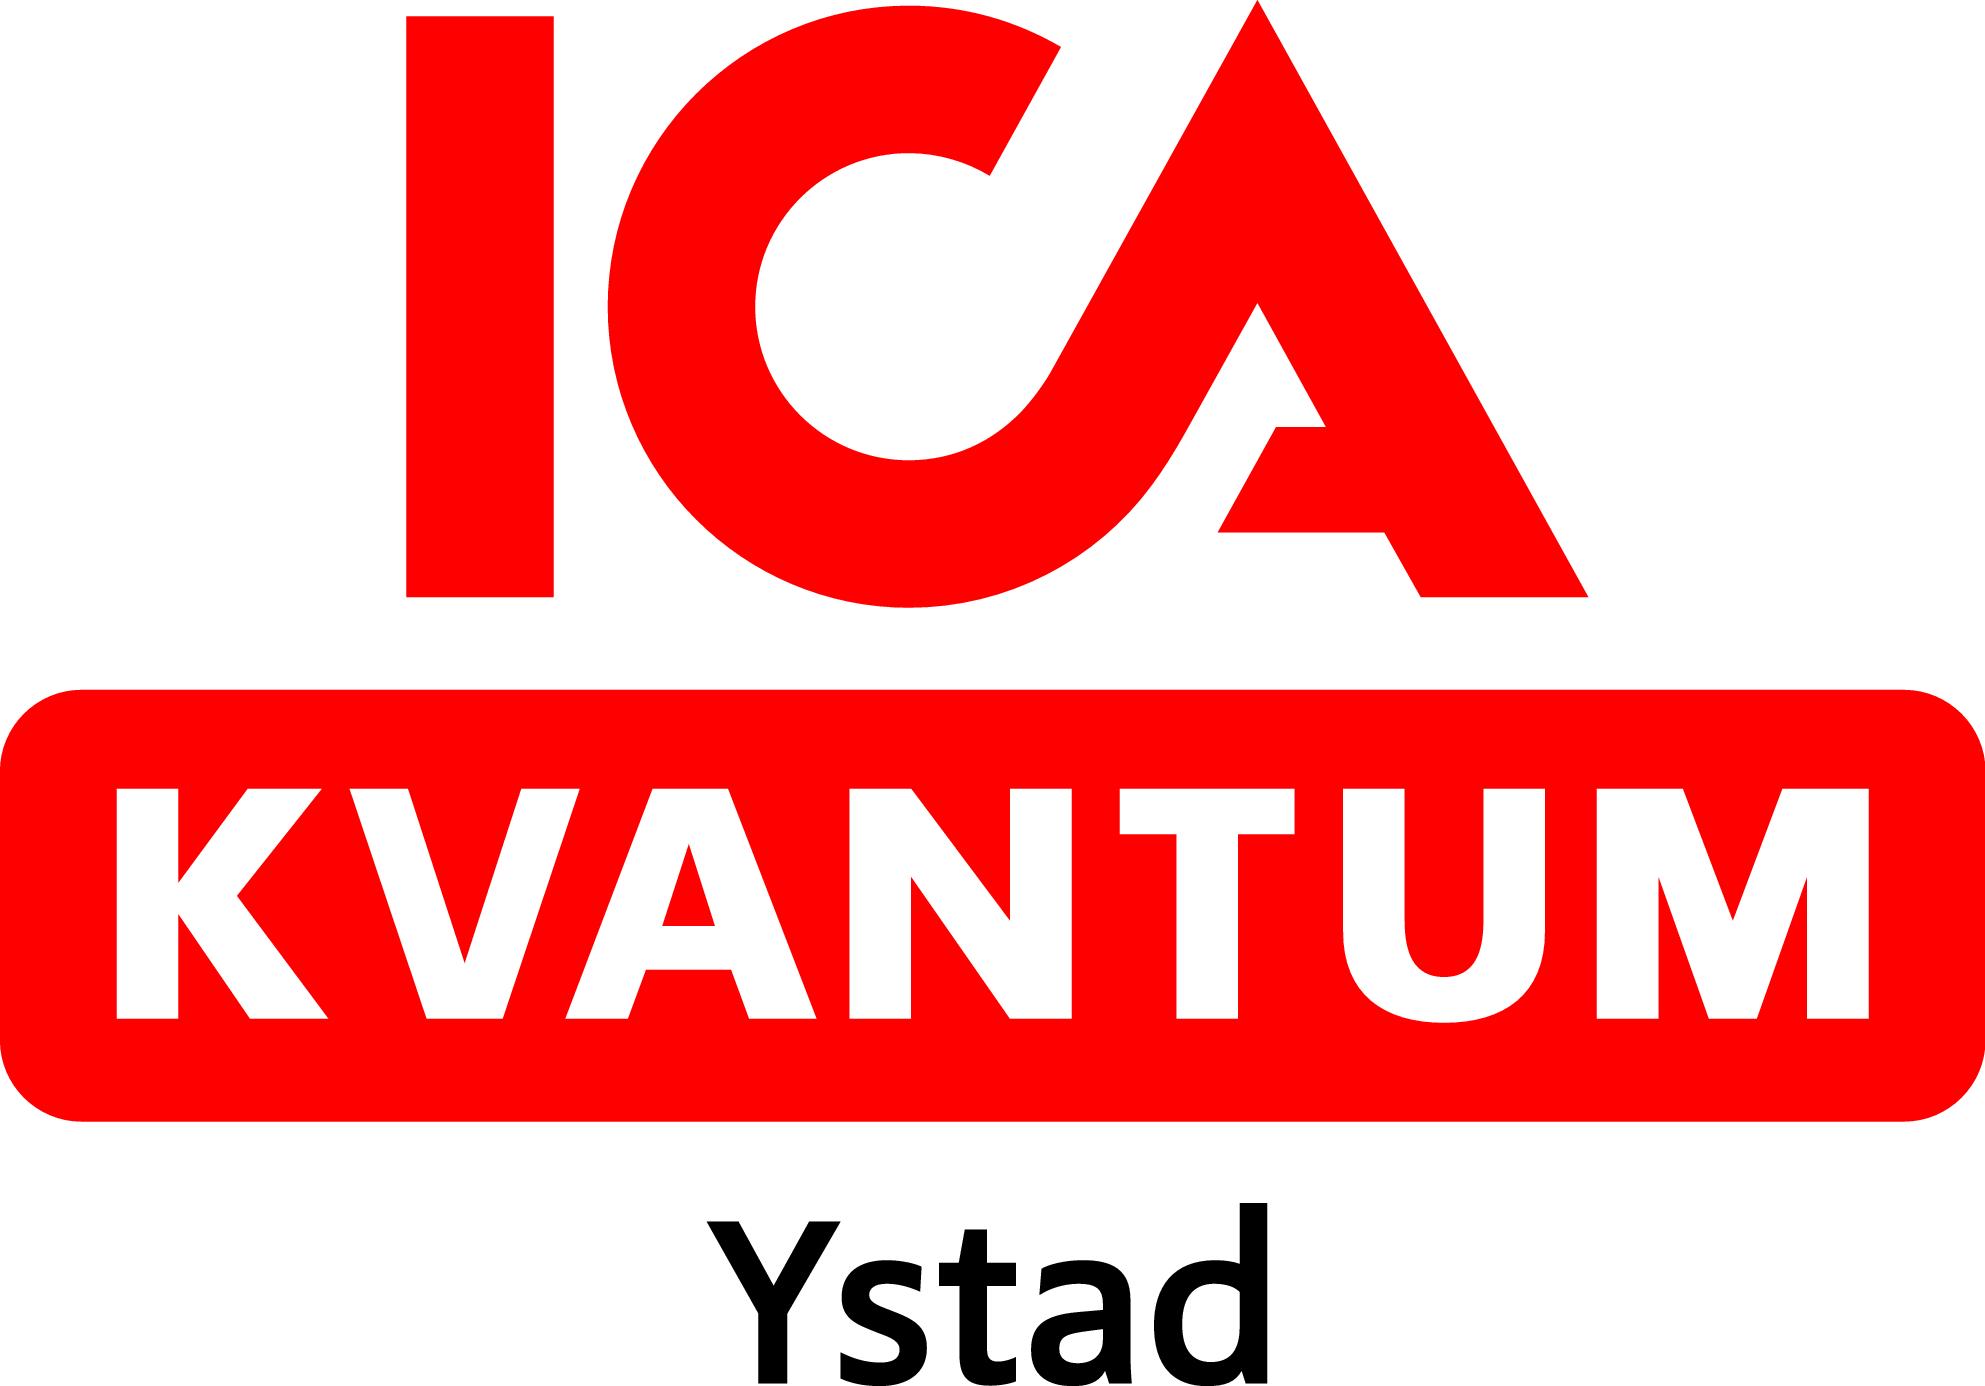 ICA Kvantum Ystad logotyp